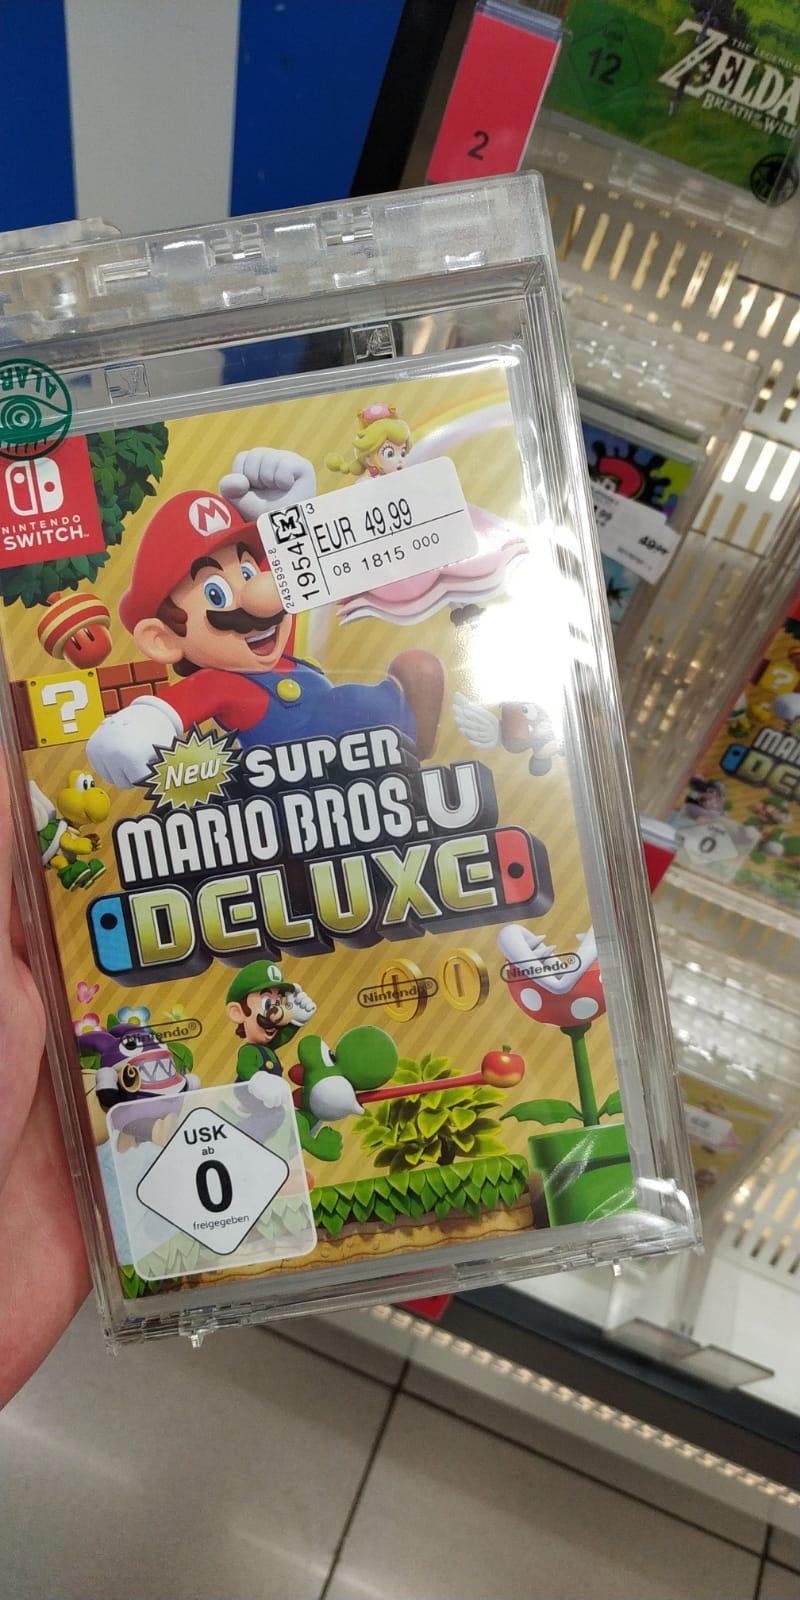 (Offline) New Super Mario BROS.U Switch